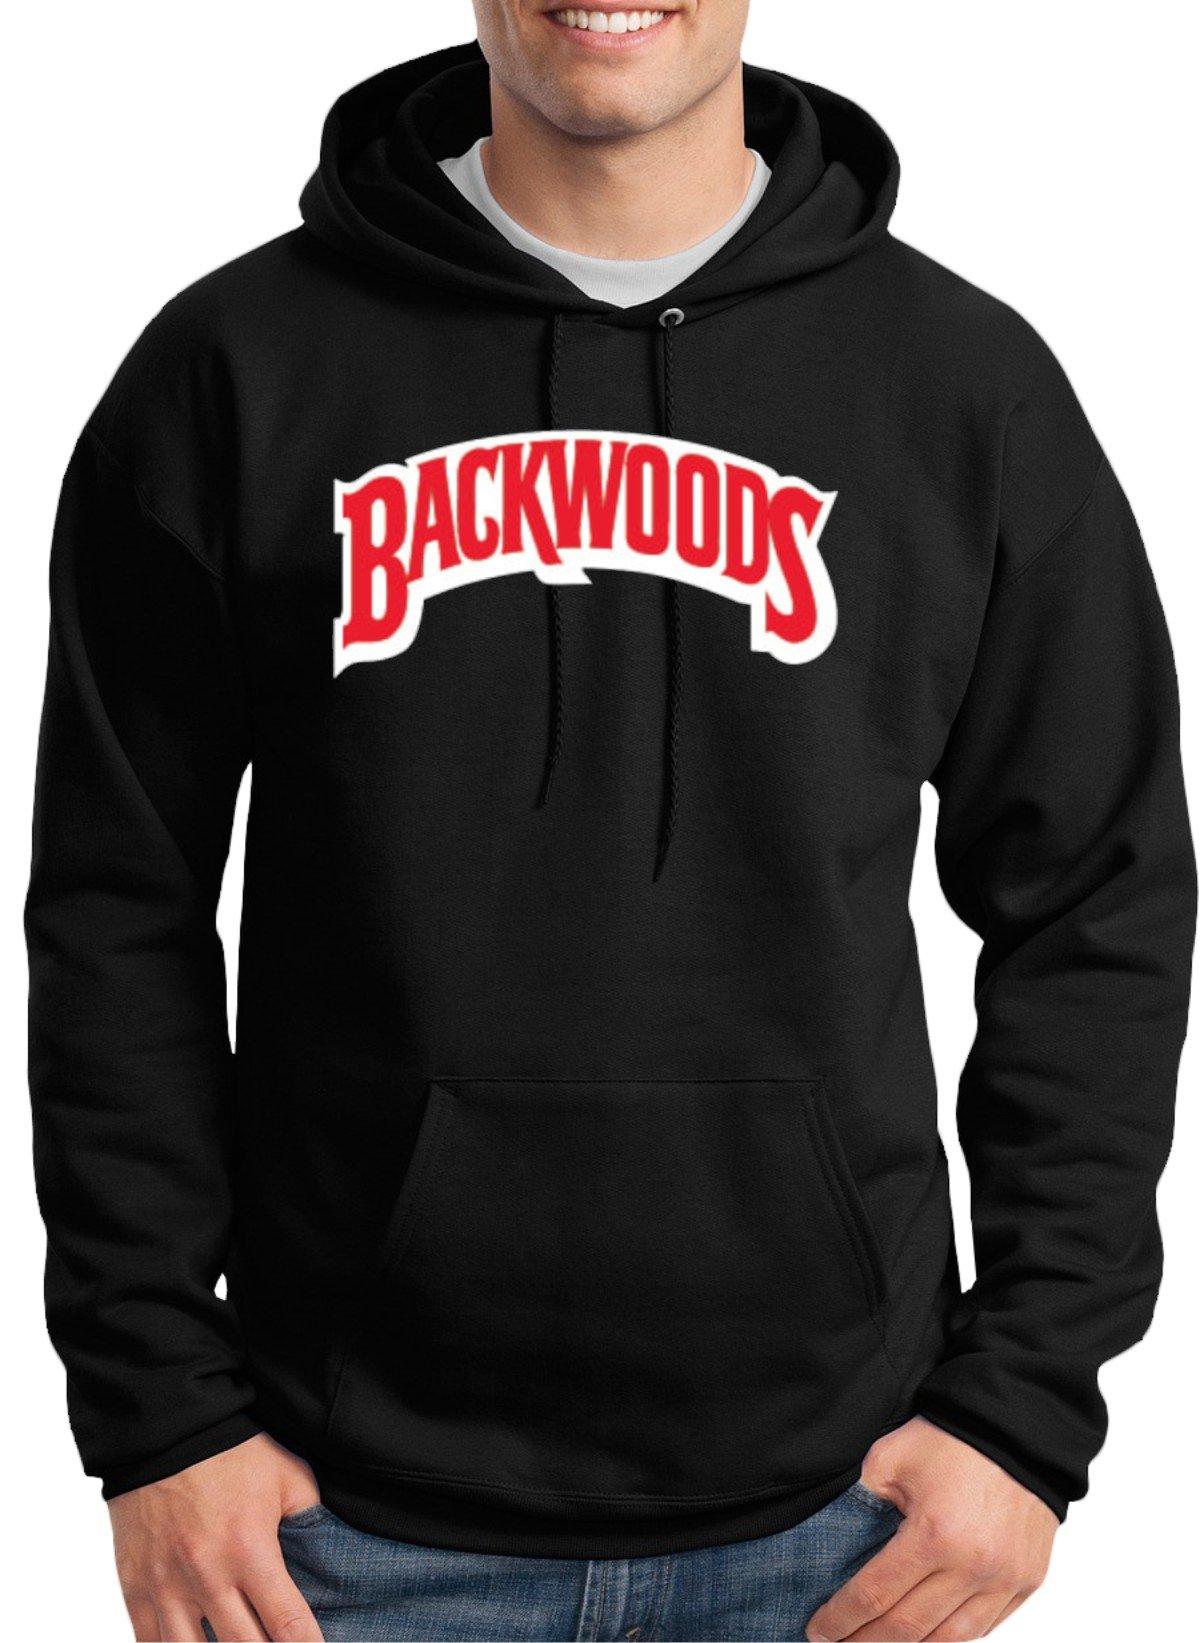 Myos Backwoods Black Shirts